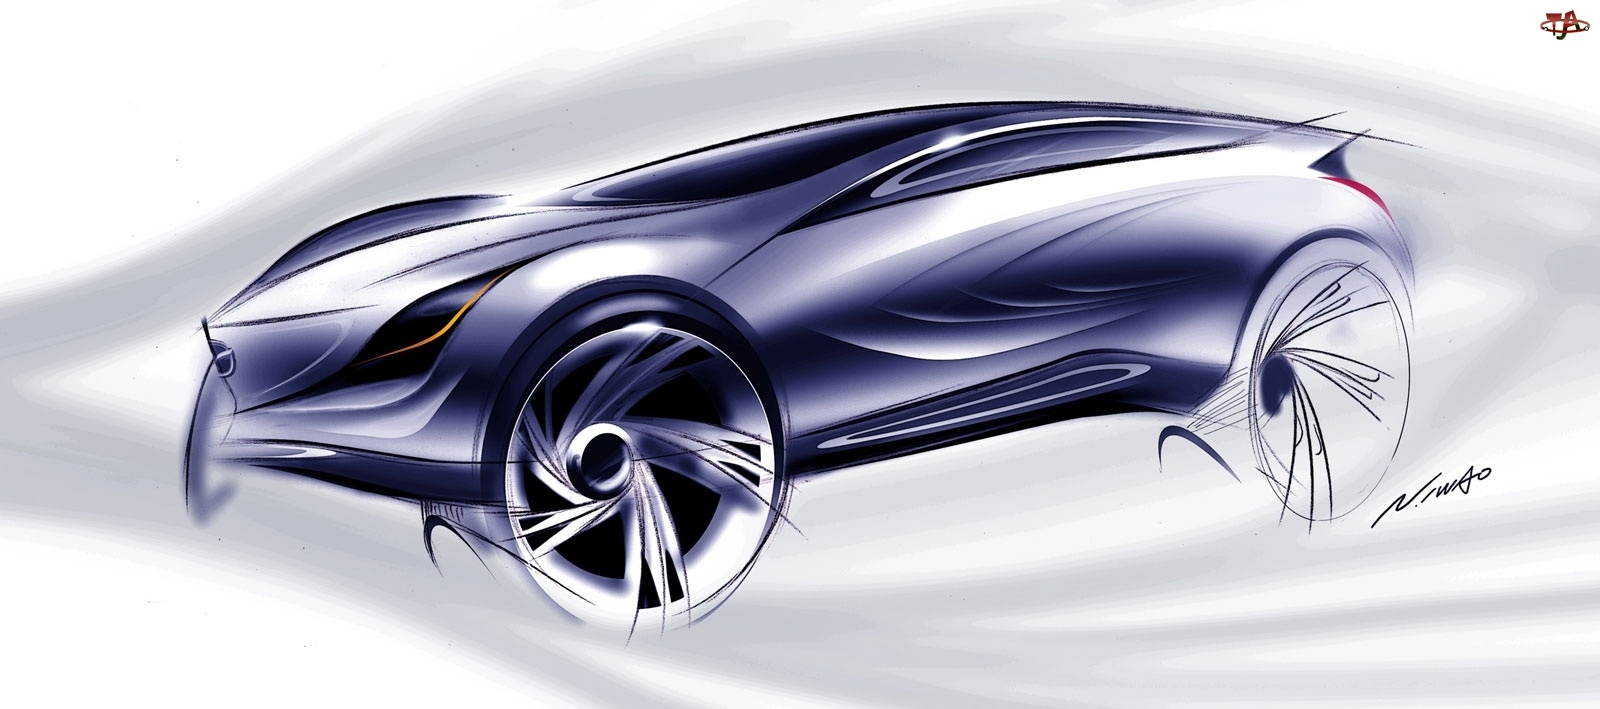 Kazamai, Szkic, Mazda, Projekt